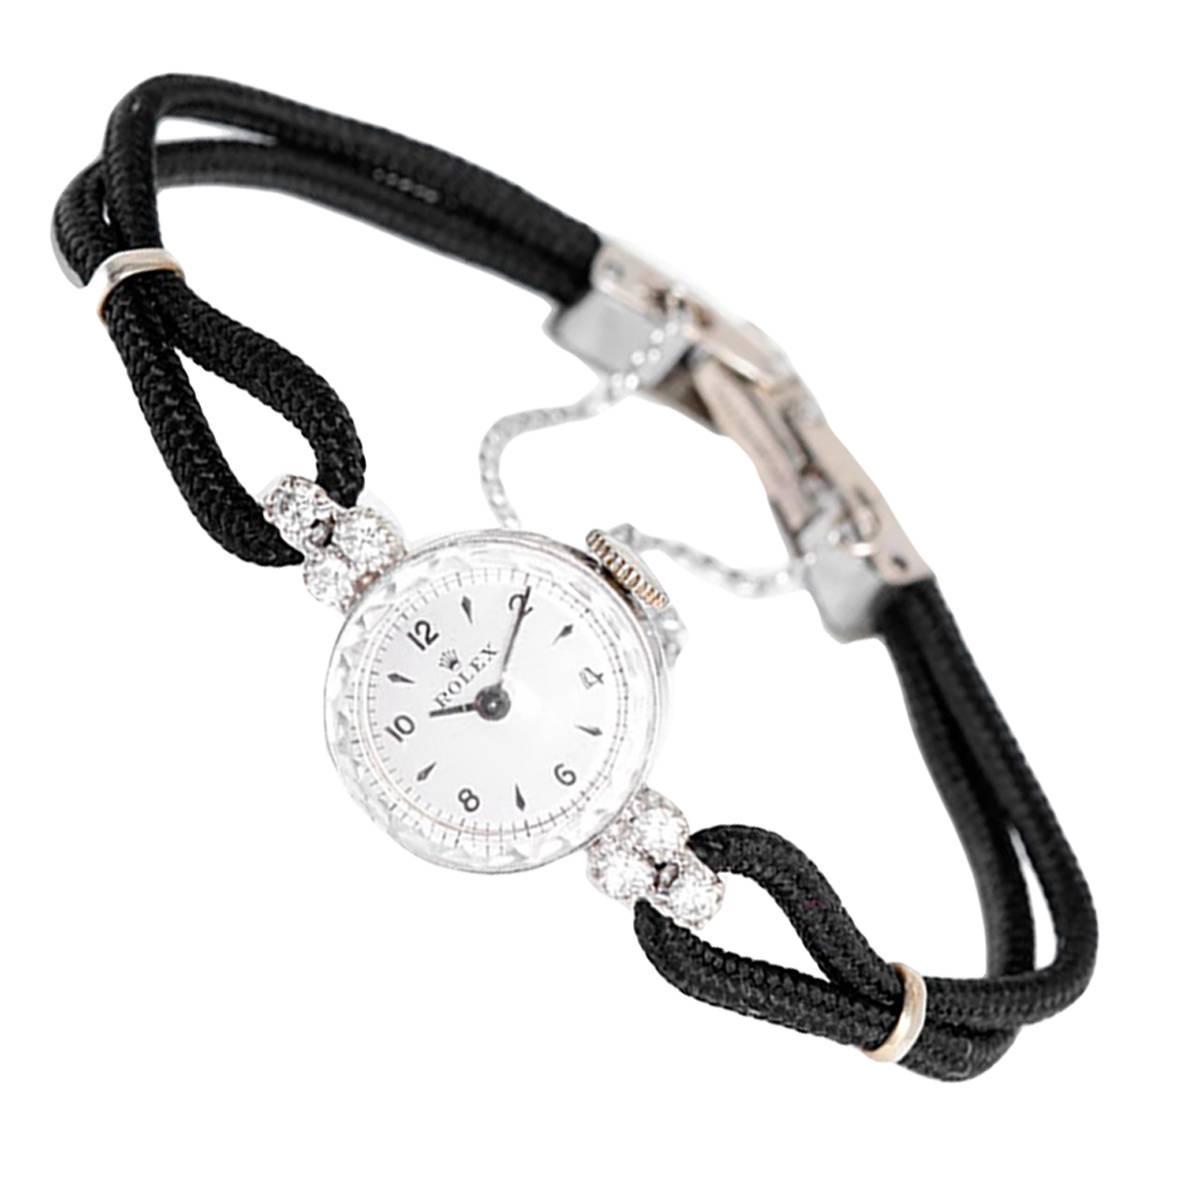 Rolex Lady's White Gold Diamond Dress Wristwatch at 1stdibs